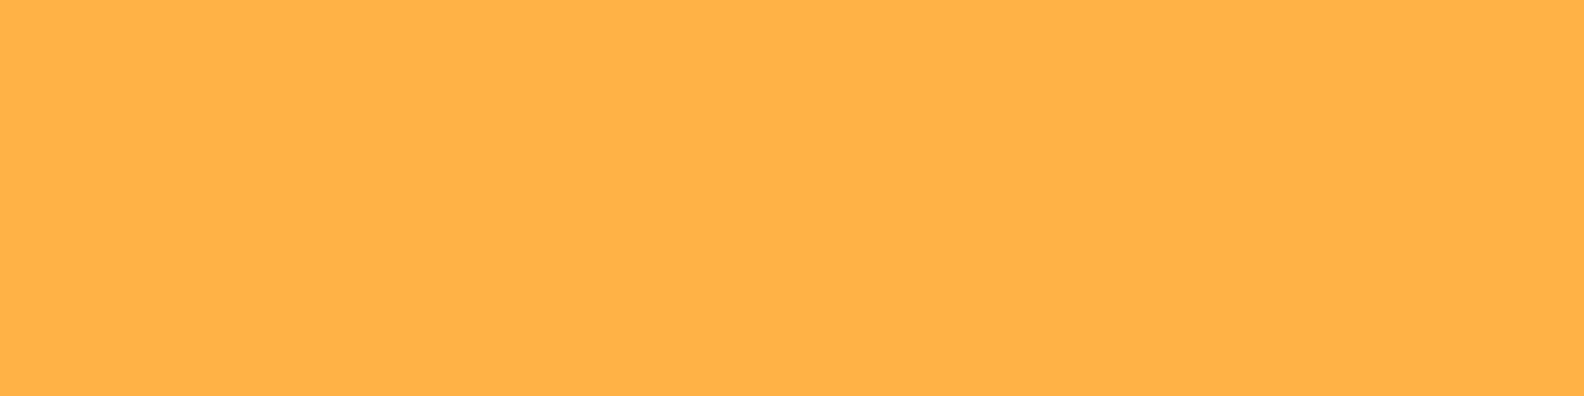 1584x396 Pastel Orange Solid Color Background